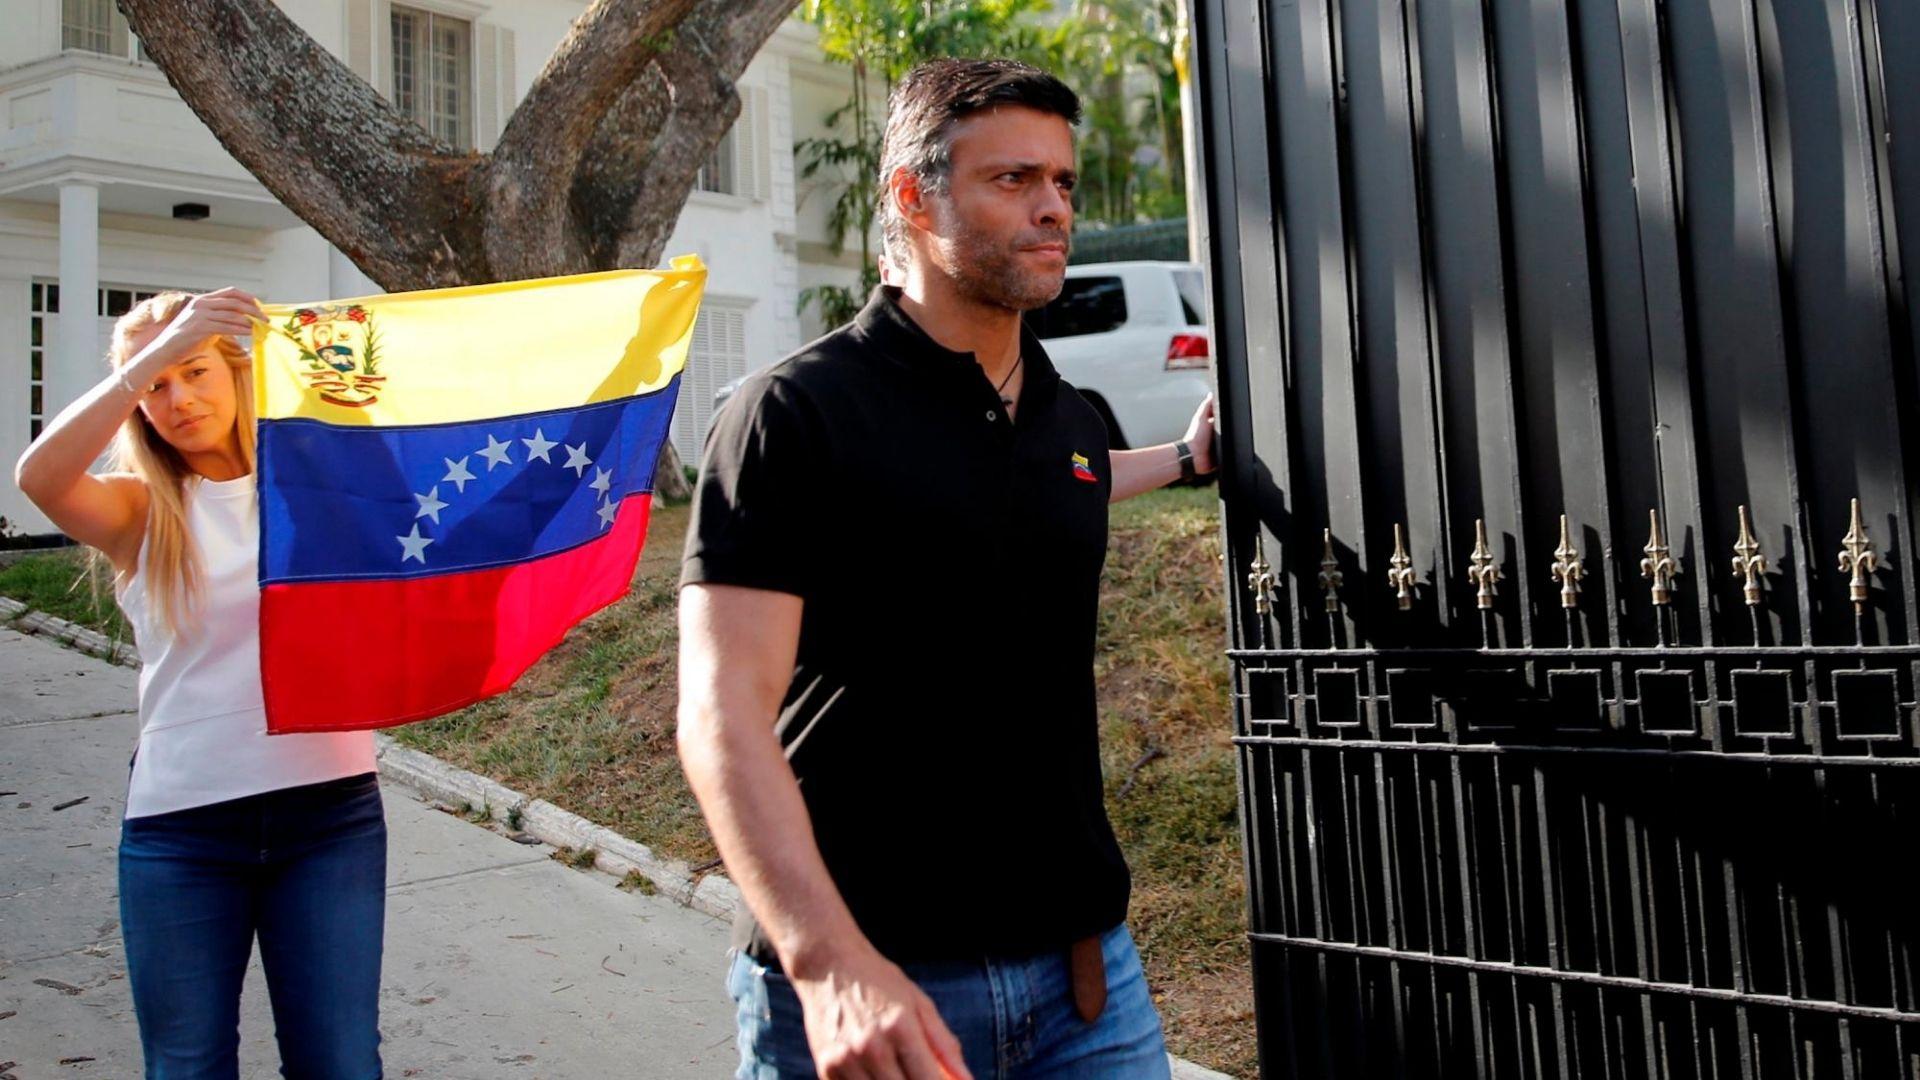 ABC revela detalles de la llegada de Leopoldo López a España: Utilizó una identidad falsa